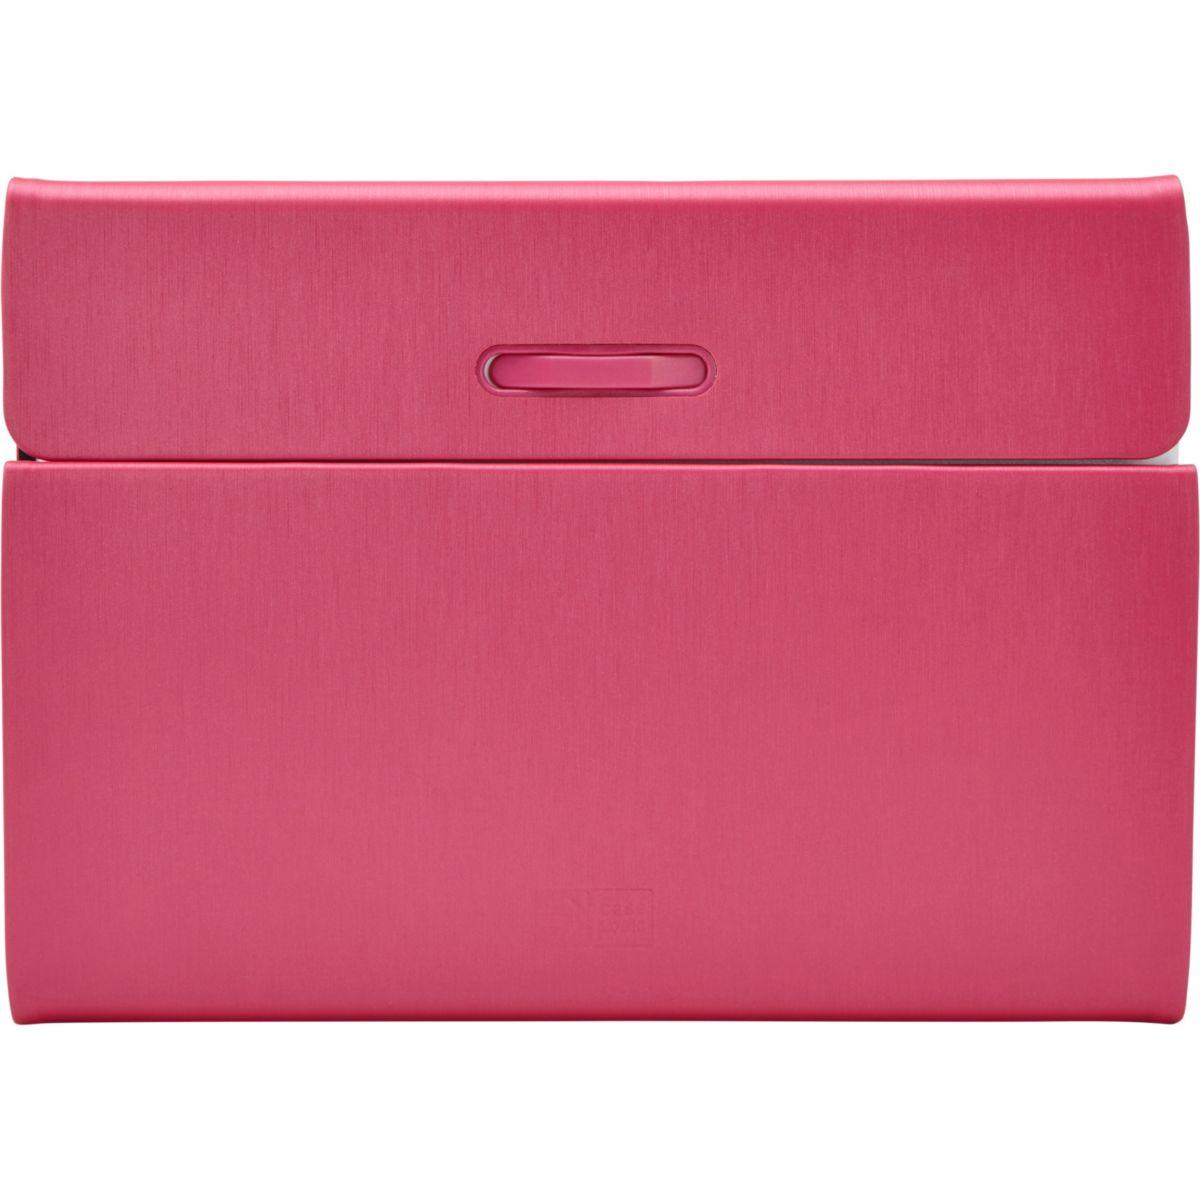 Etui tablette caselogic porte-folio rotatif rose ipad air 2 - livraison offerte : code premium (photo)